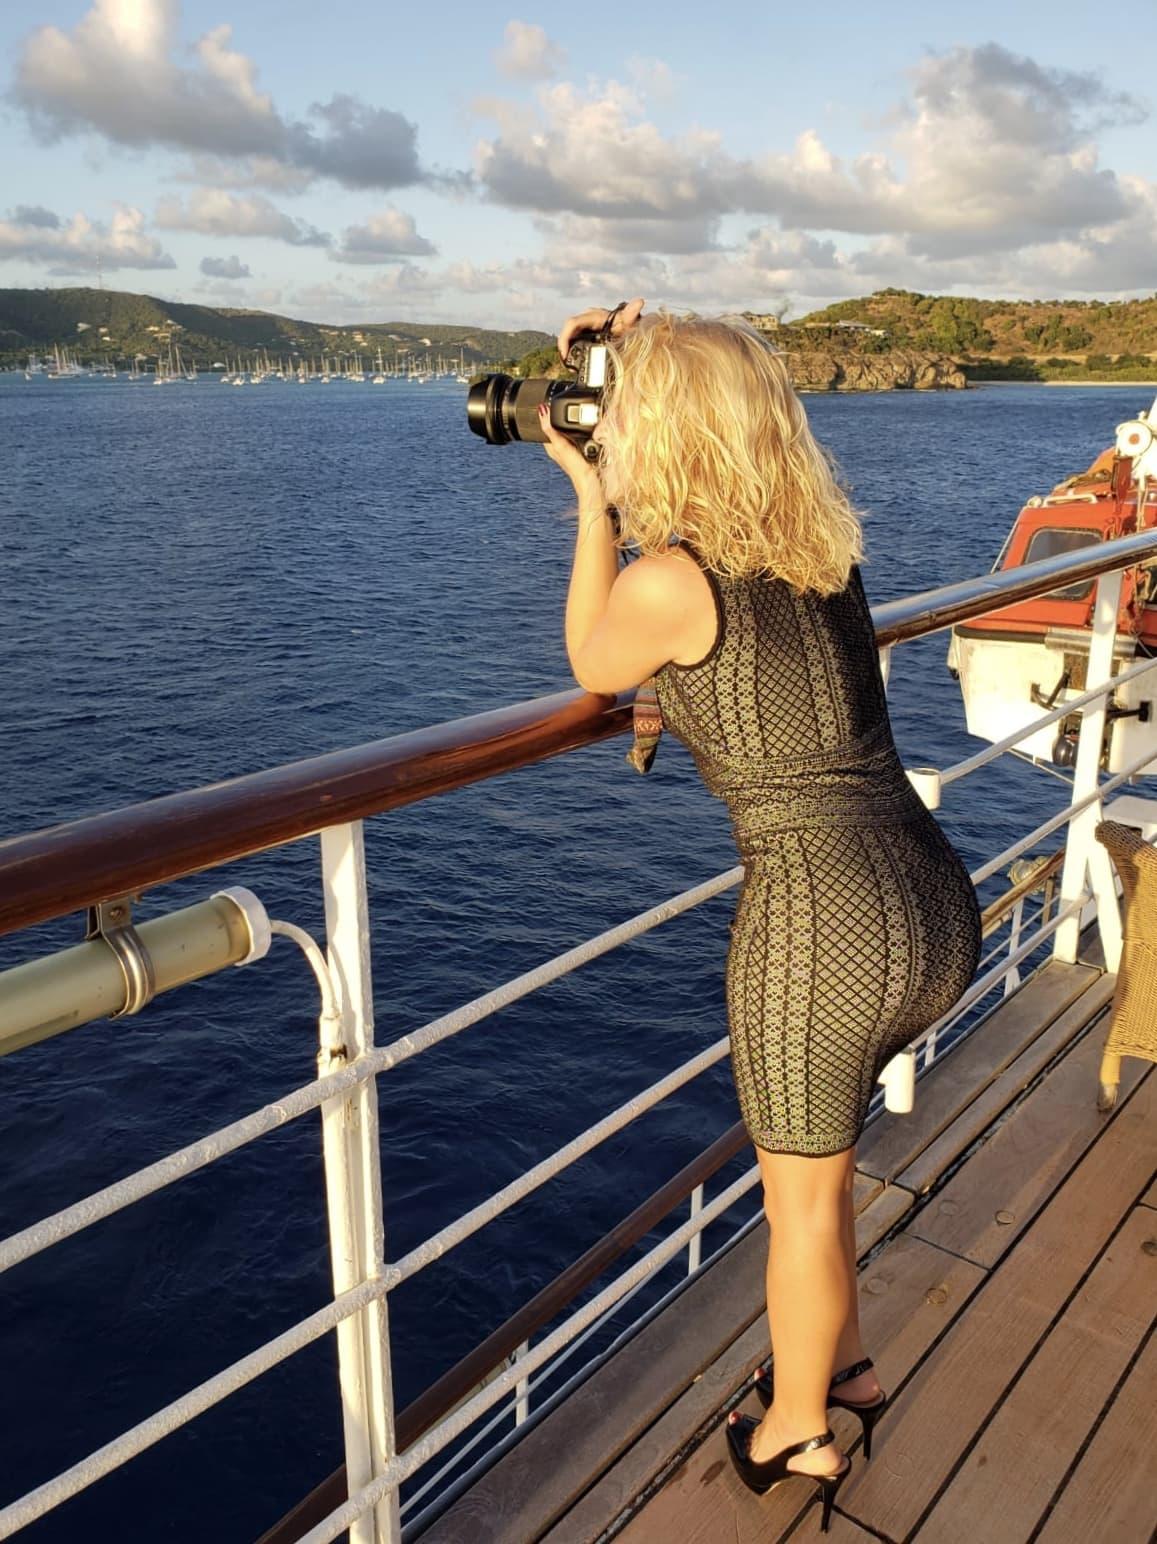 Olympus OM-D E-M5 Mark II, Olympus E-M5, M.Zuiko Lens, M.Zuiko DIgital ED 14-150mm, M.Zuiko Digital ED 7-14mm, best small cameras, camera for travelers, lightweight cameras, best mirrorless, mirrorlessonthemove, get olympus